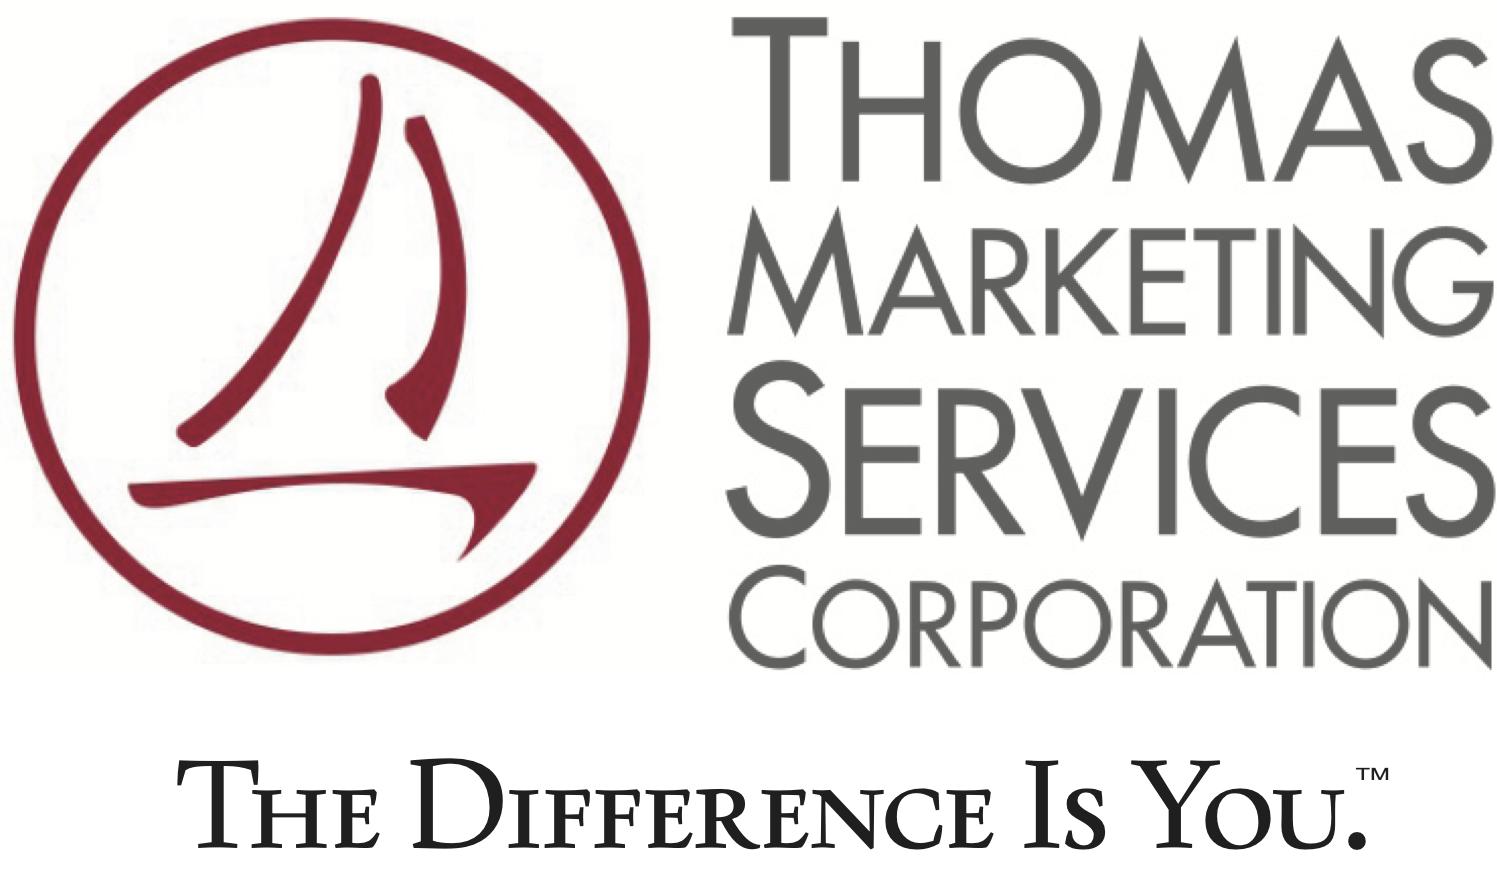 Thomas Marketing Services